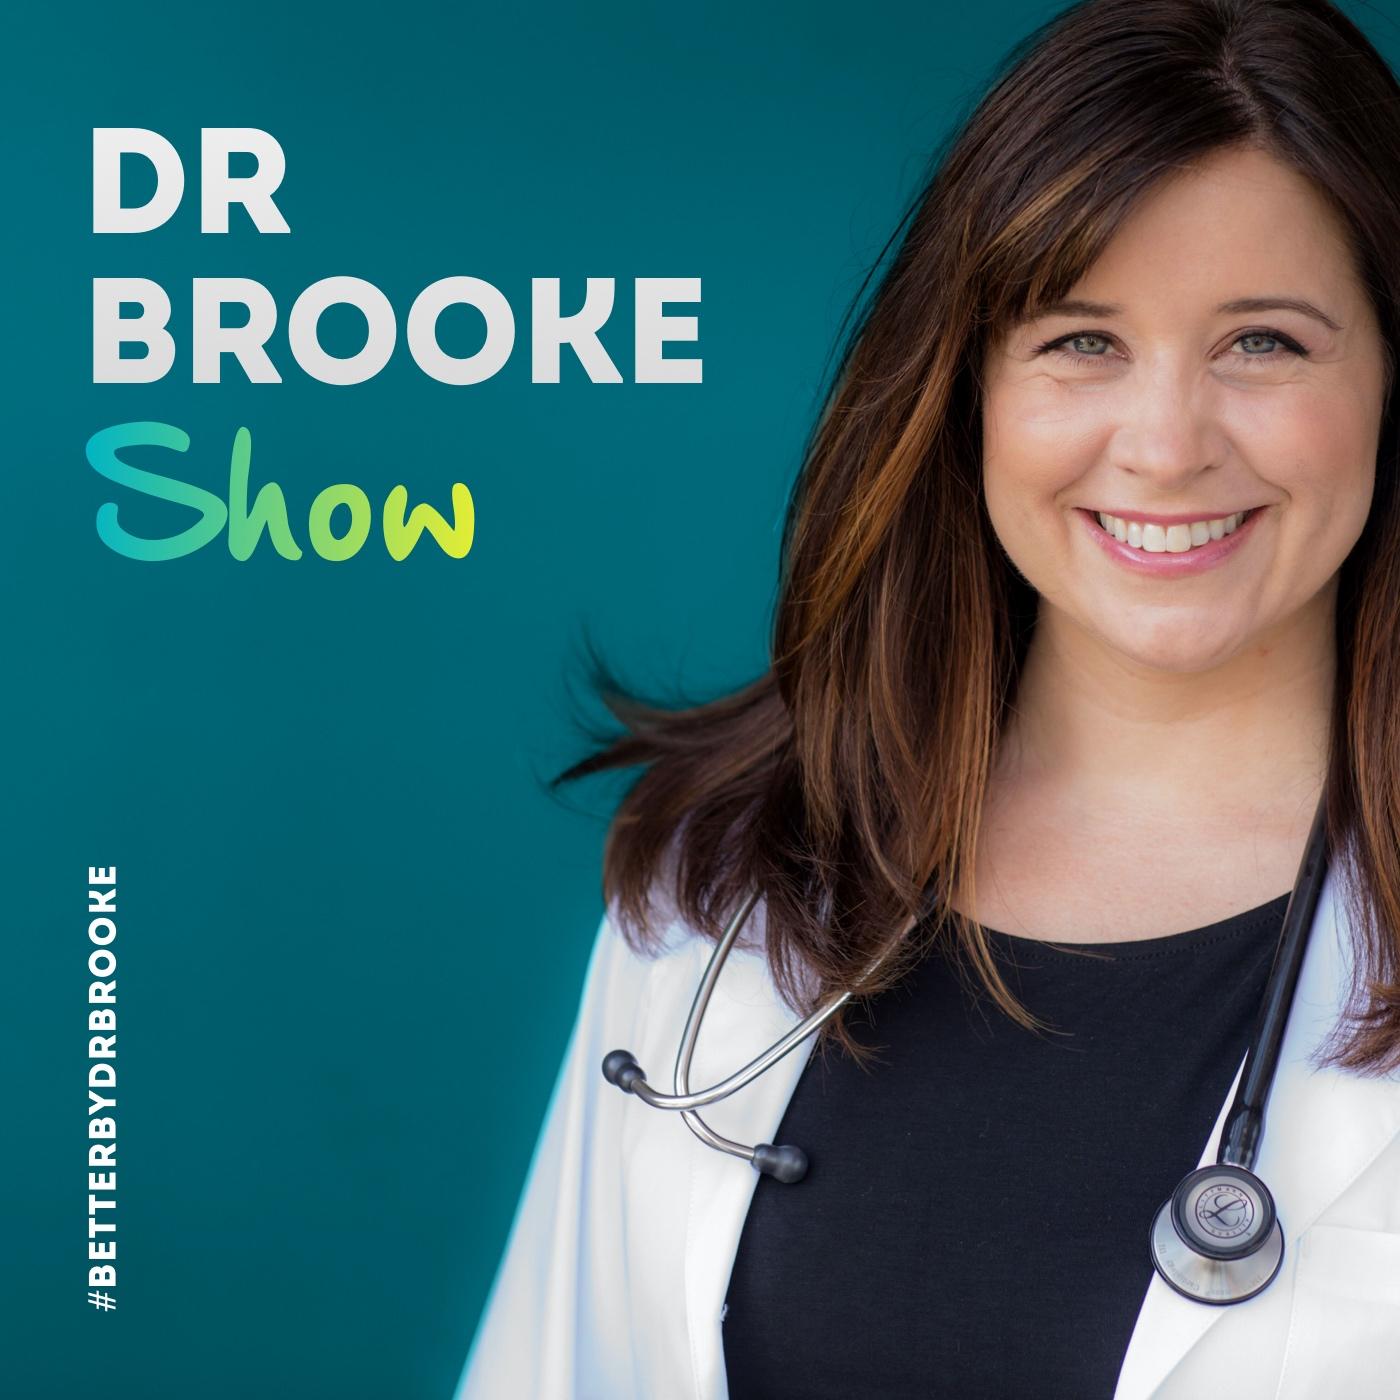 Dr. Brooke Show show art